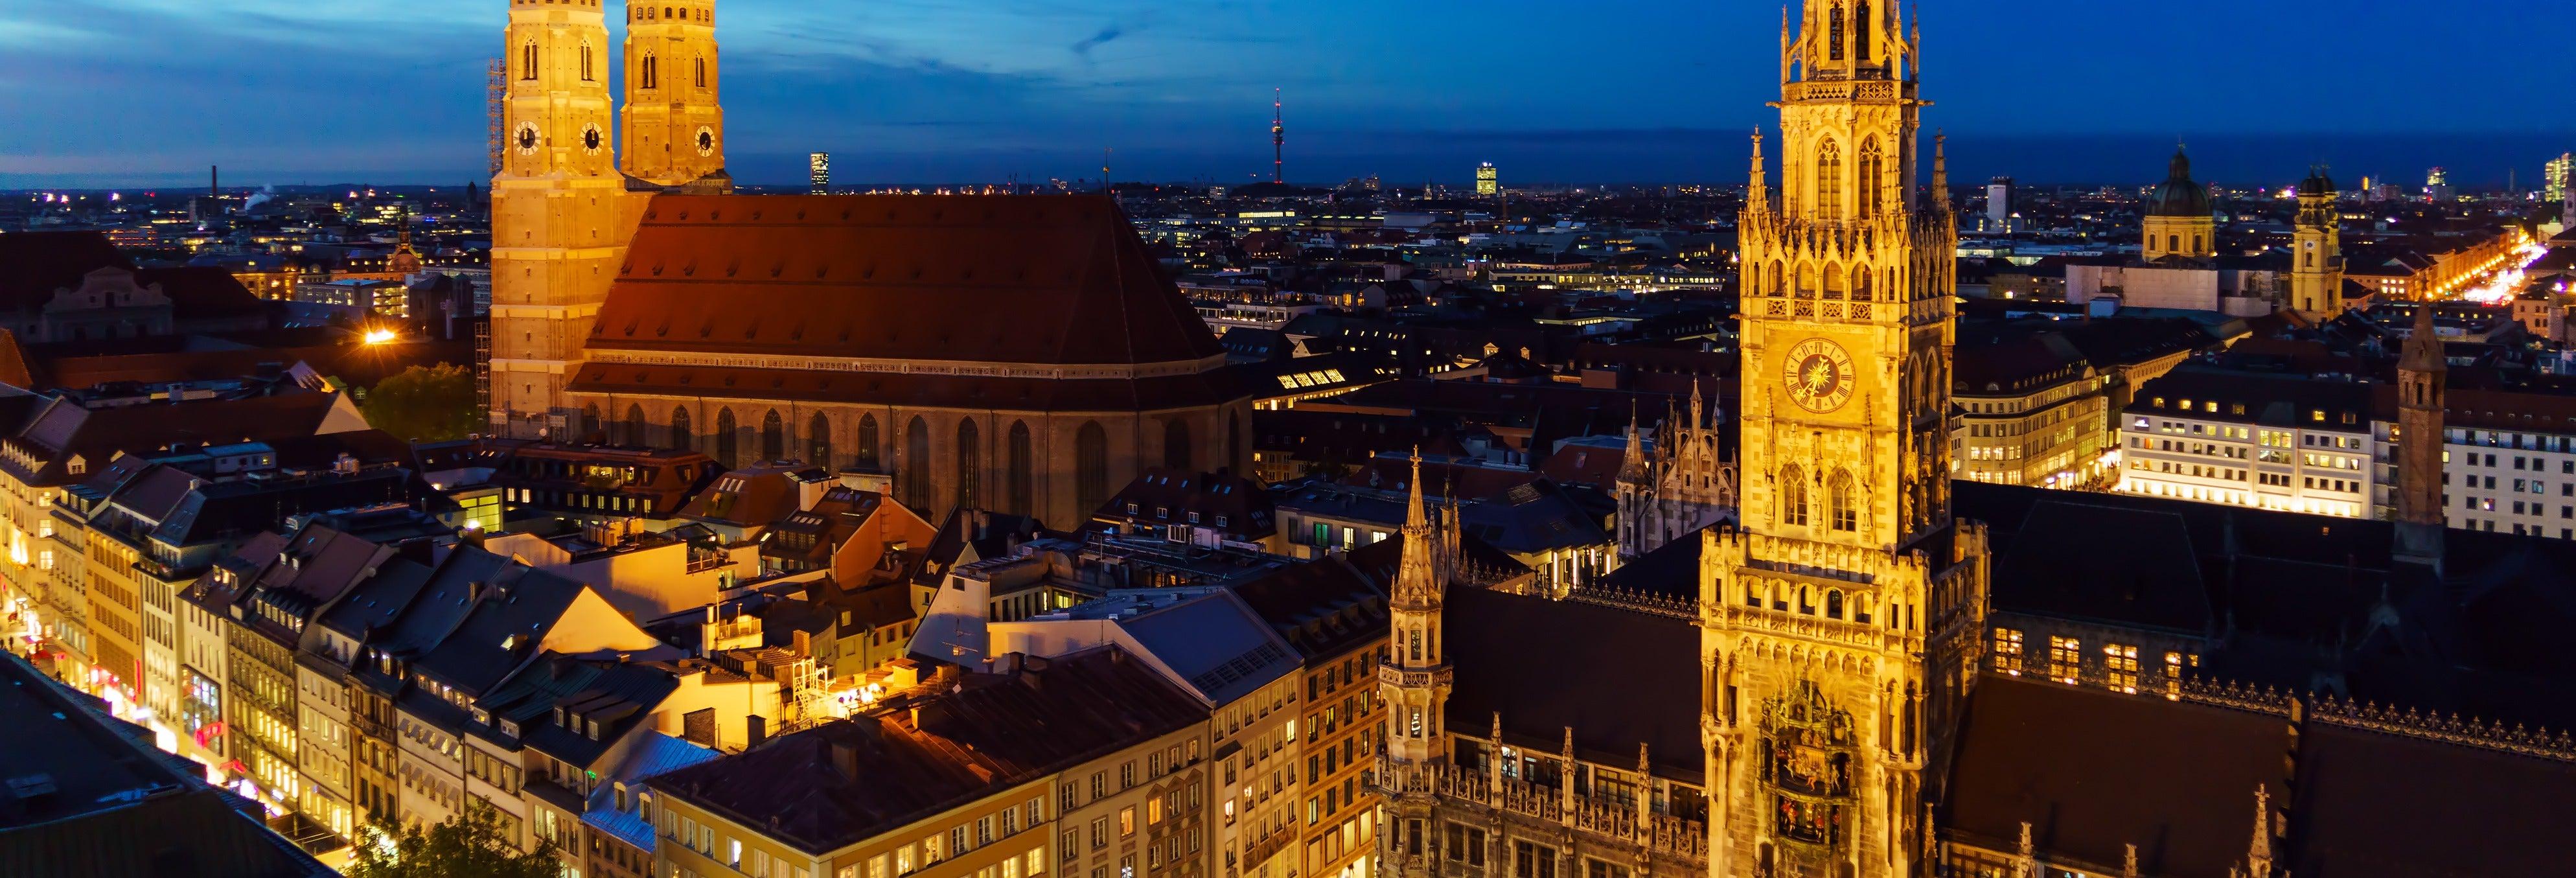 Munich Christmas Markets Tour